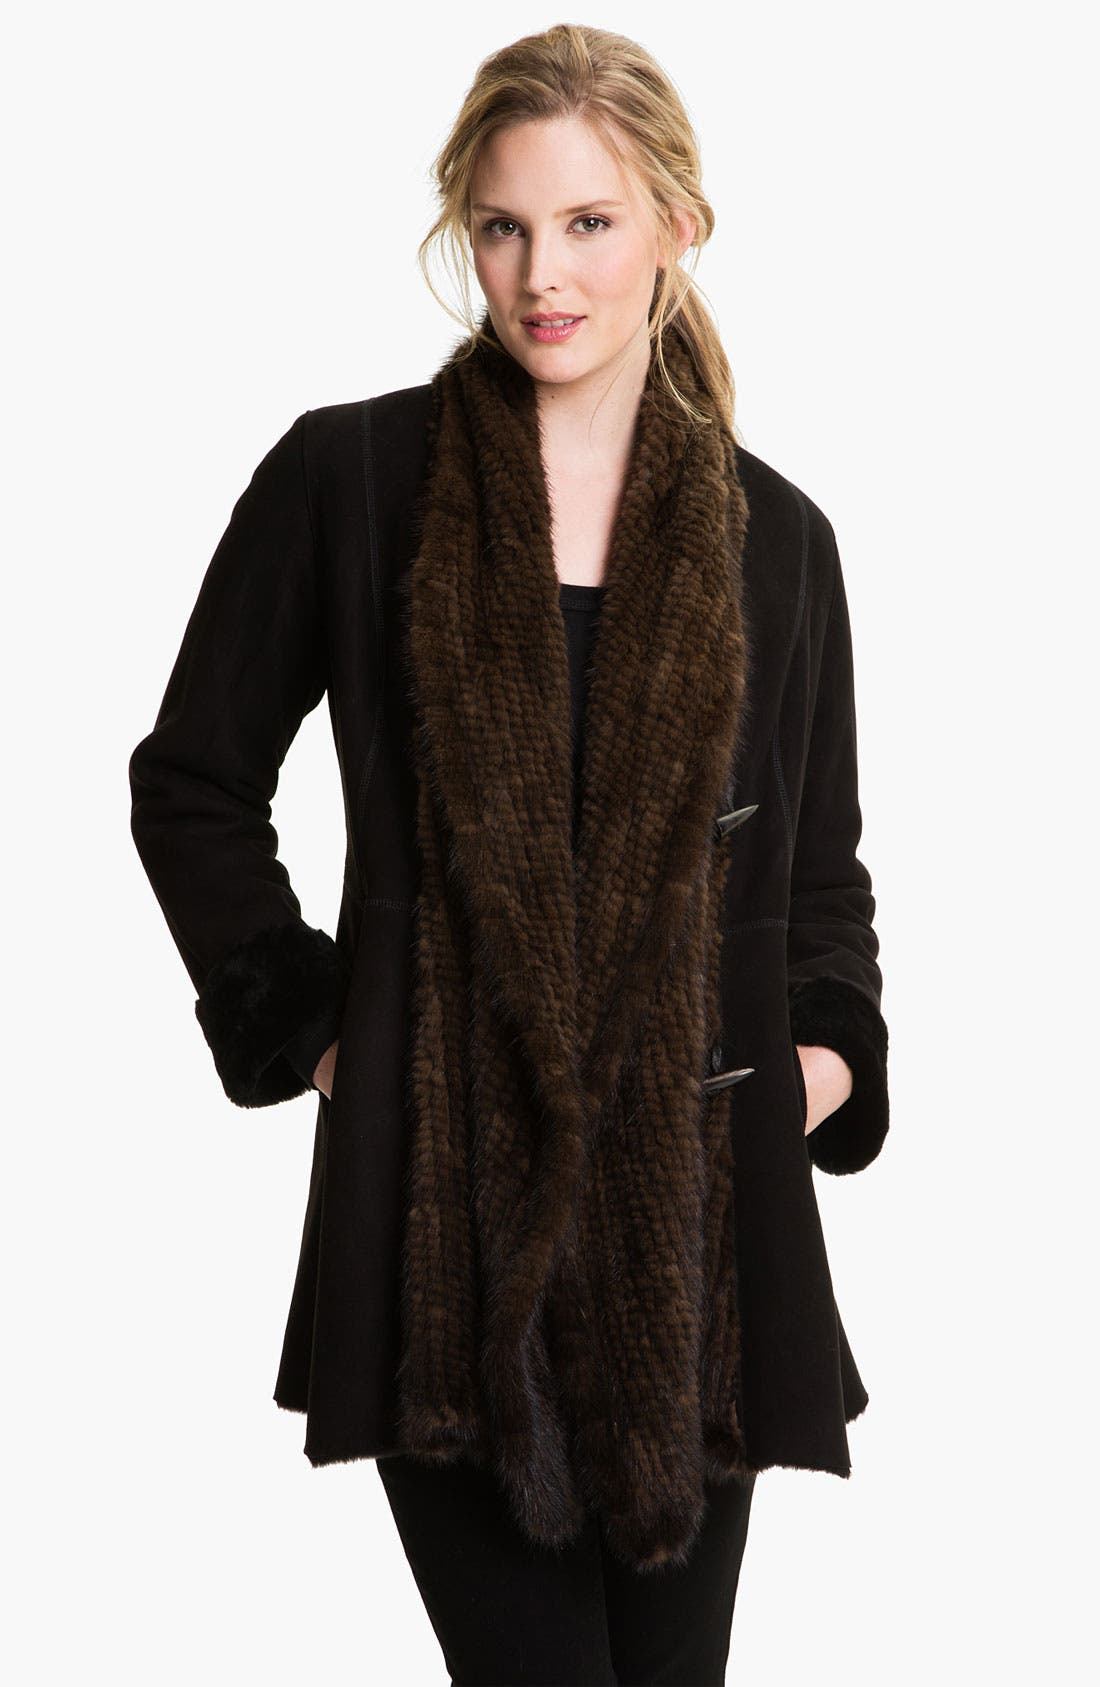 Main Image - HIDESOCIETY Genuine Shearling Coat with Genuine Mink Trim